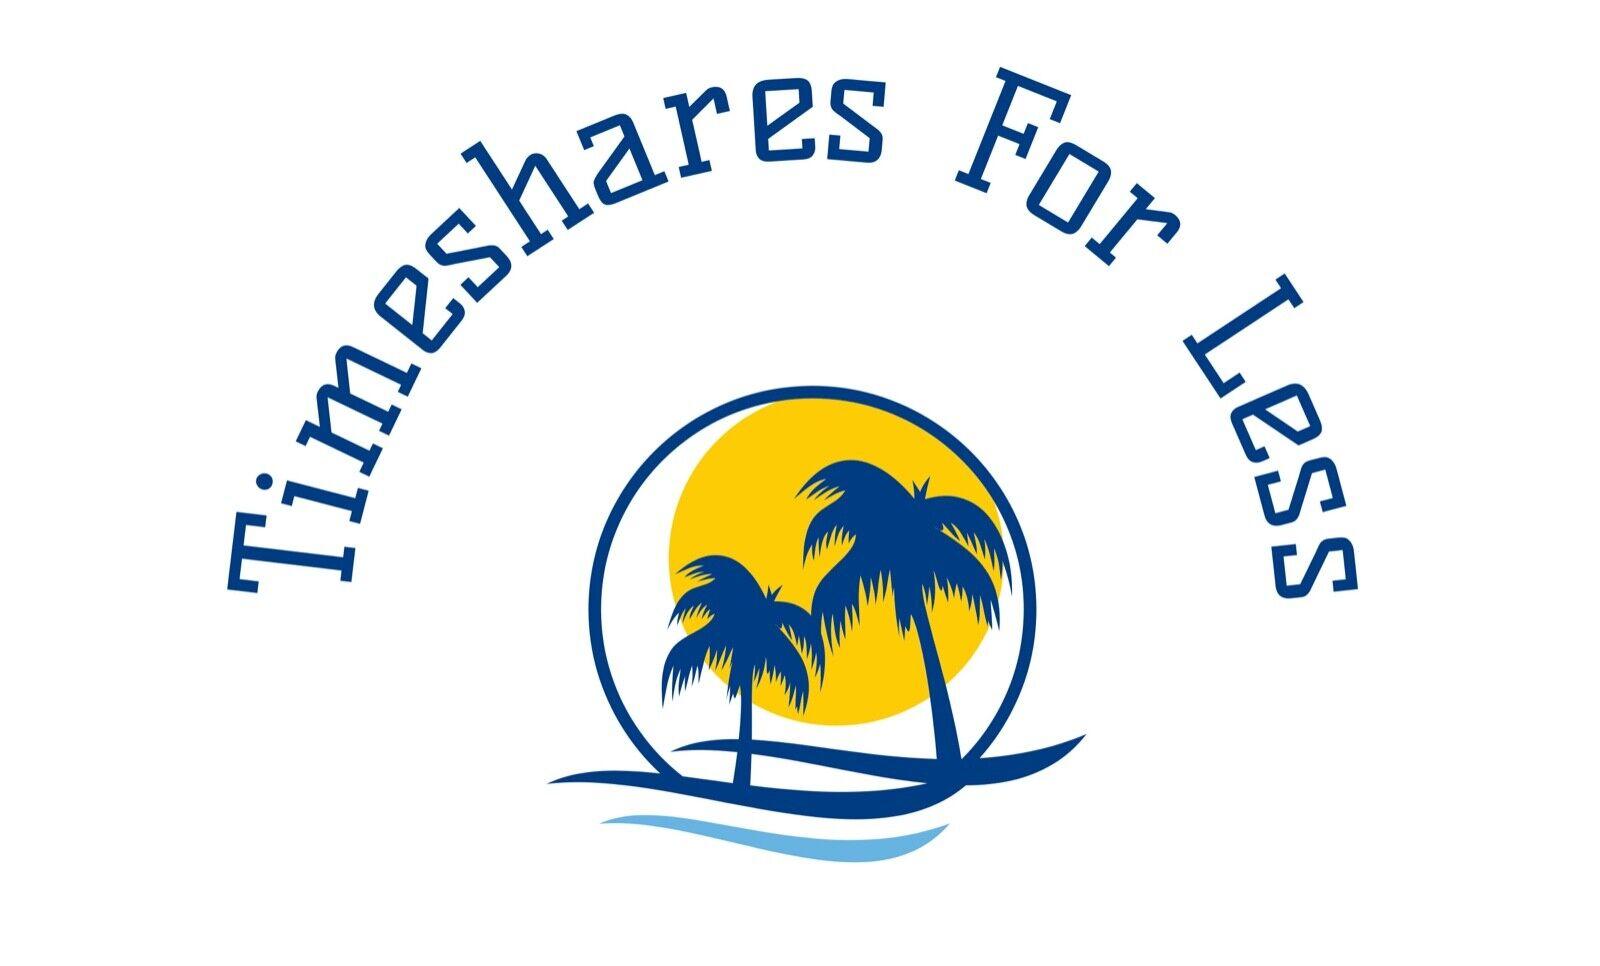 WYNDHAM STAR ISLAND RESORT 189,000 PTS ANNUAL 2020 PTS AVAILABLE KISSIMMEE FL - $375.00